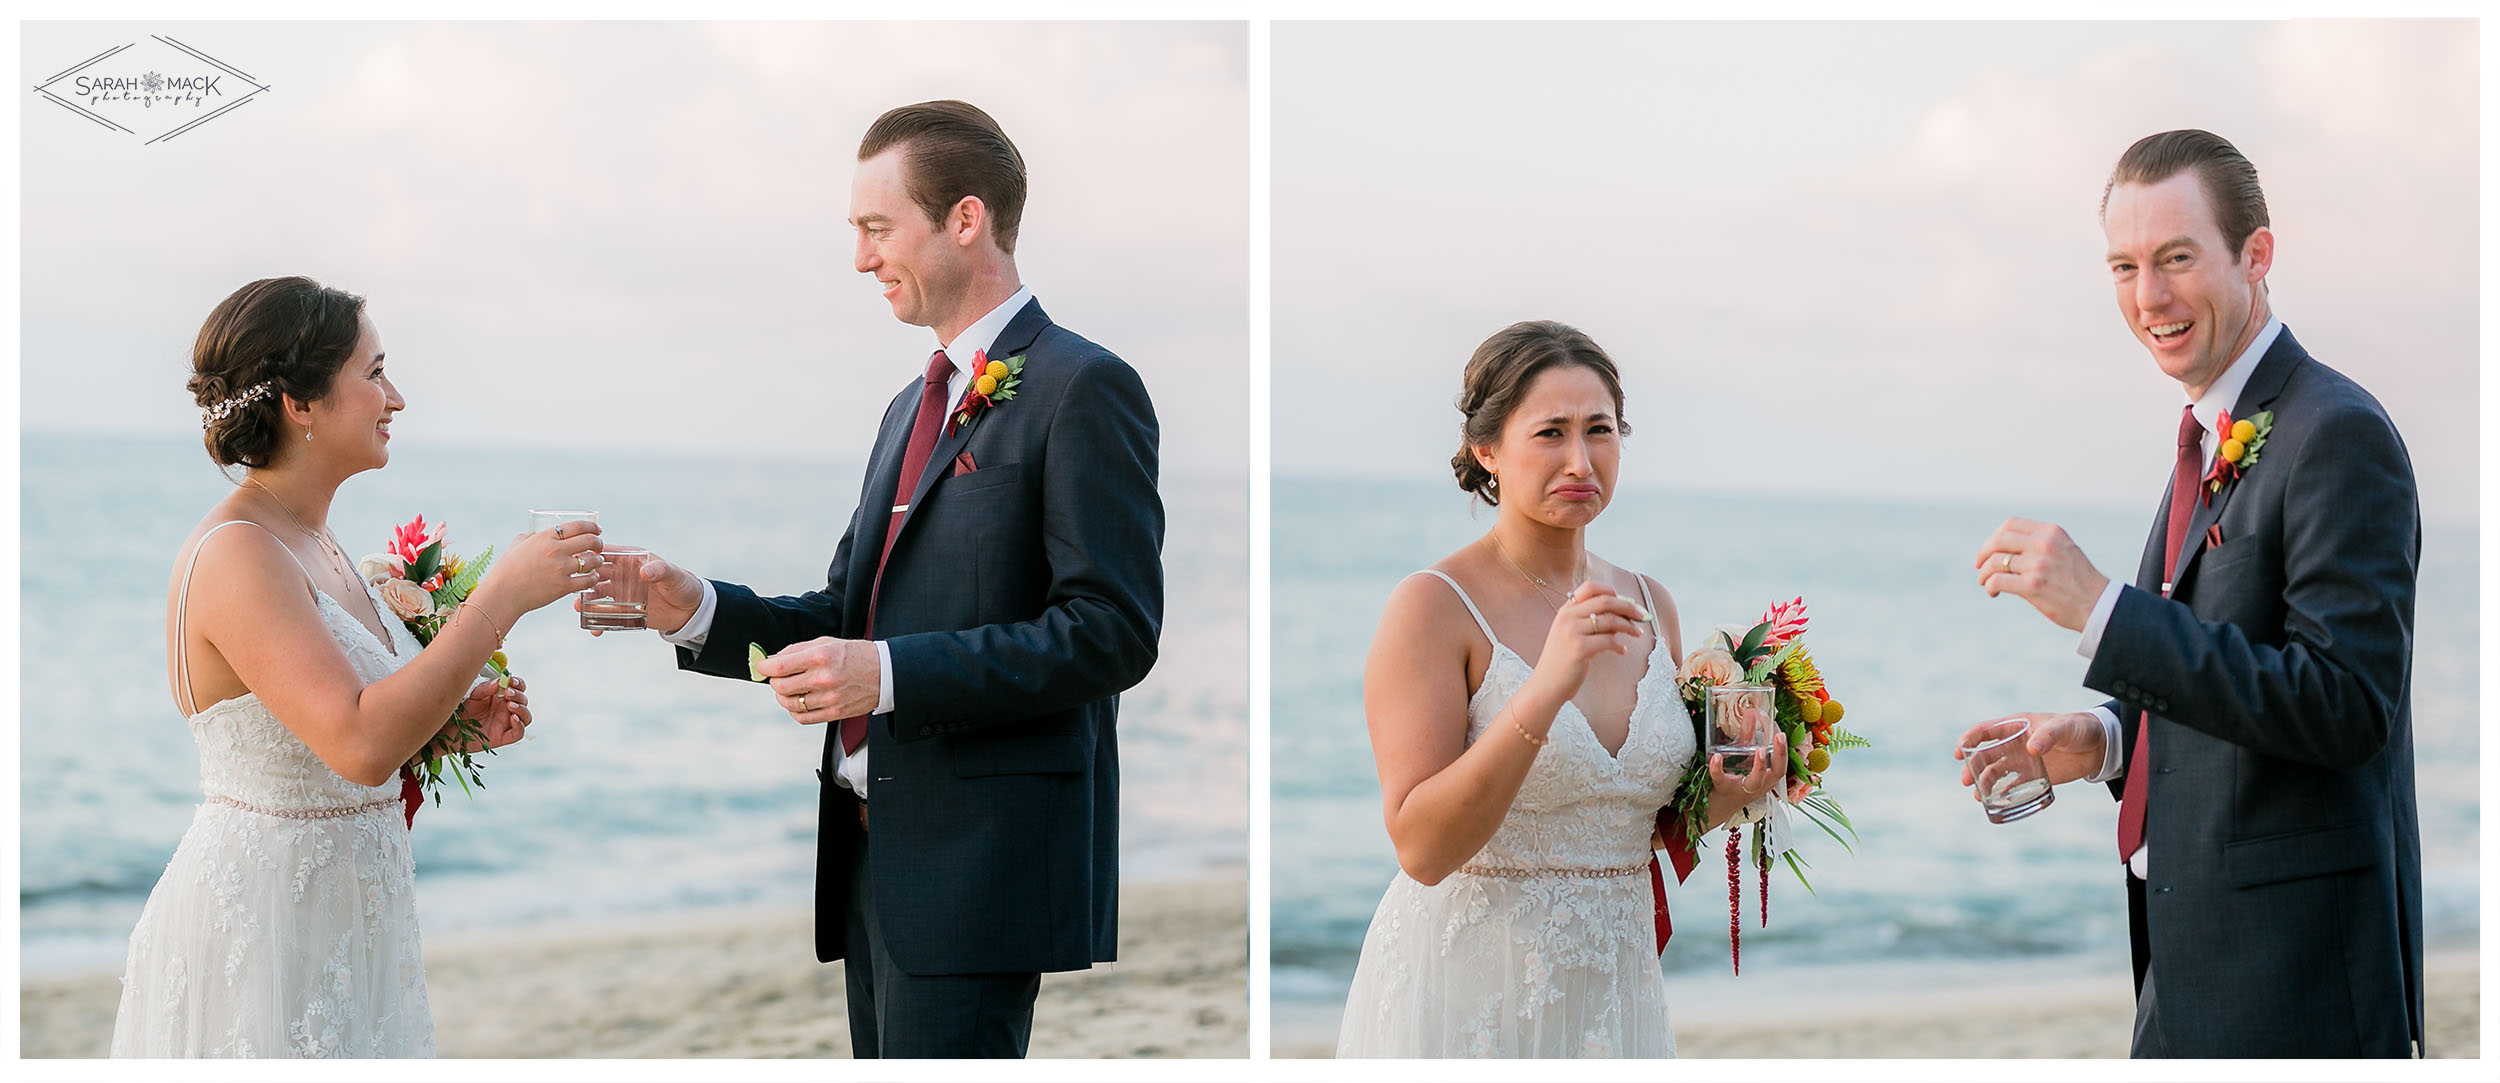 ES-Flor-de-Playa-Sayulita-Wedding-Photography-46.jpg